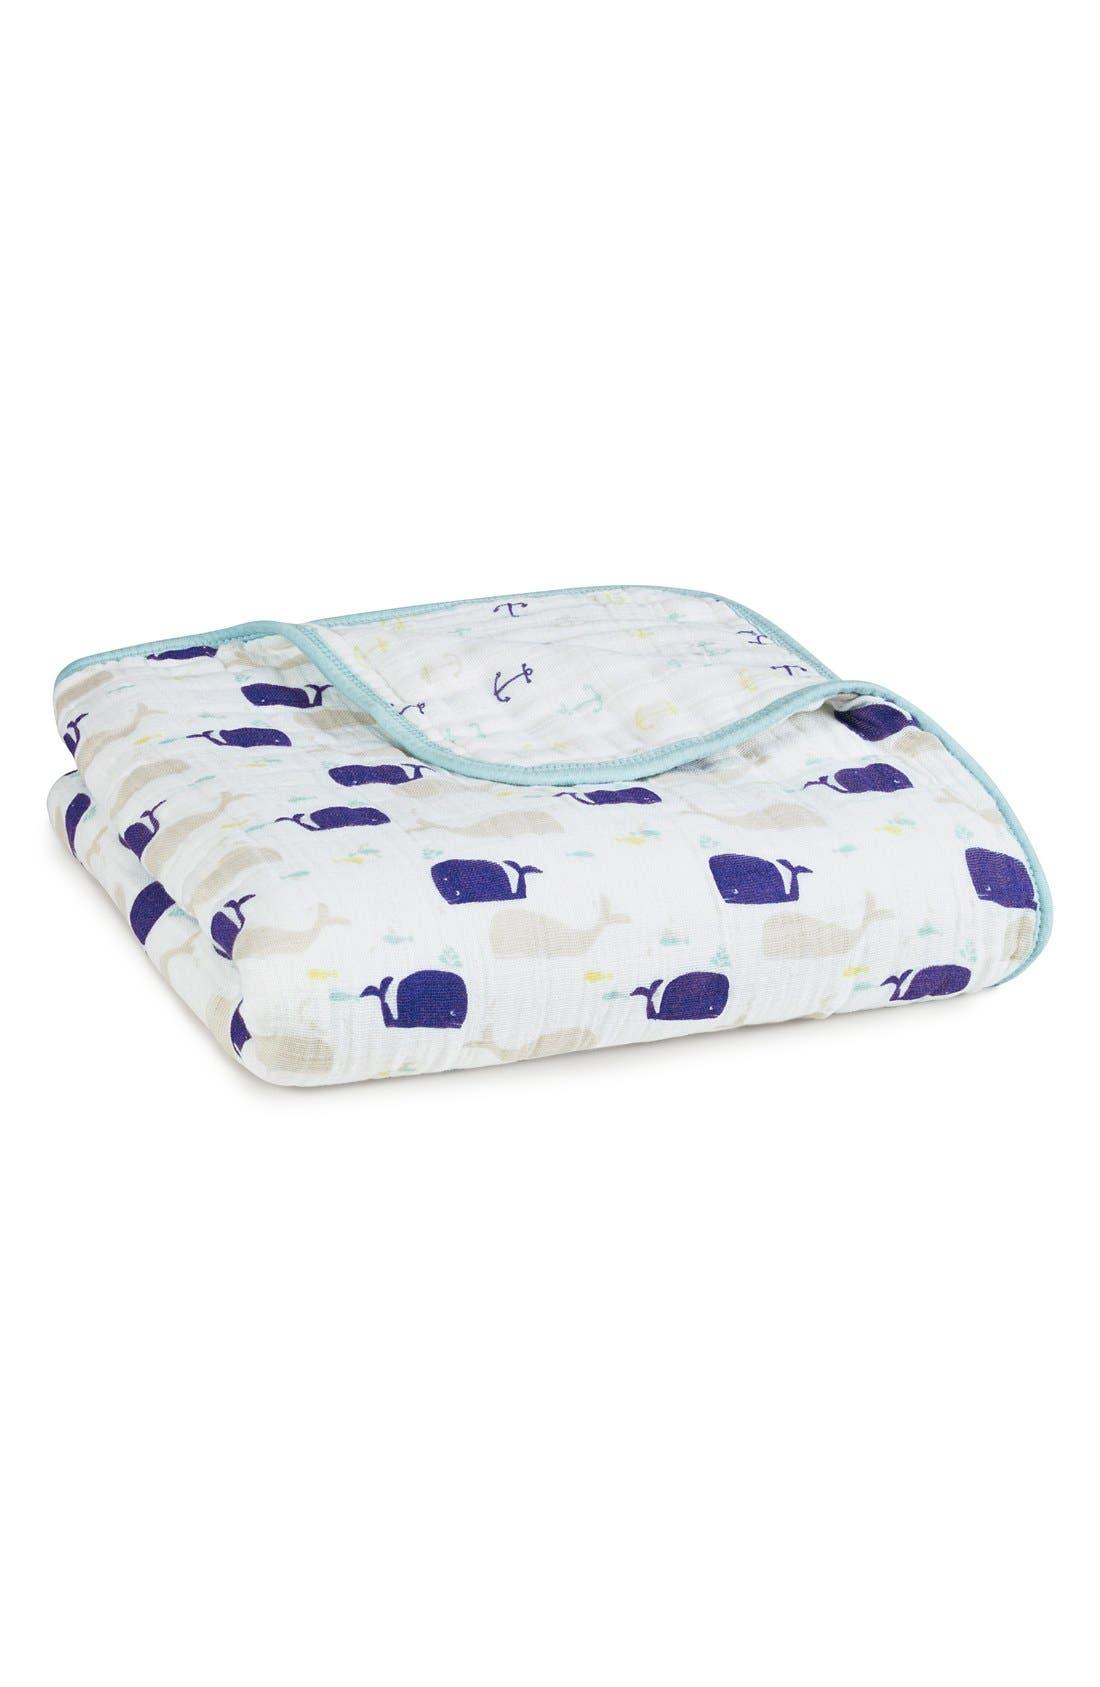 ADEN + ANAIS Classic Dream Blanket<sup>™</sup>, Main, color, HIGH SEAS